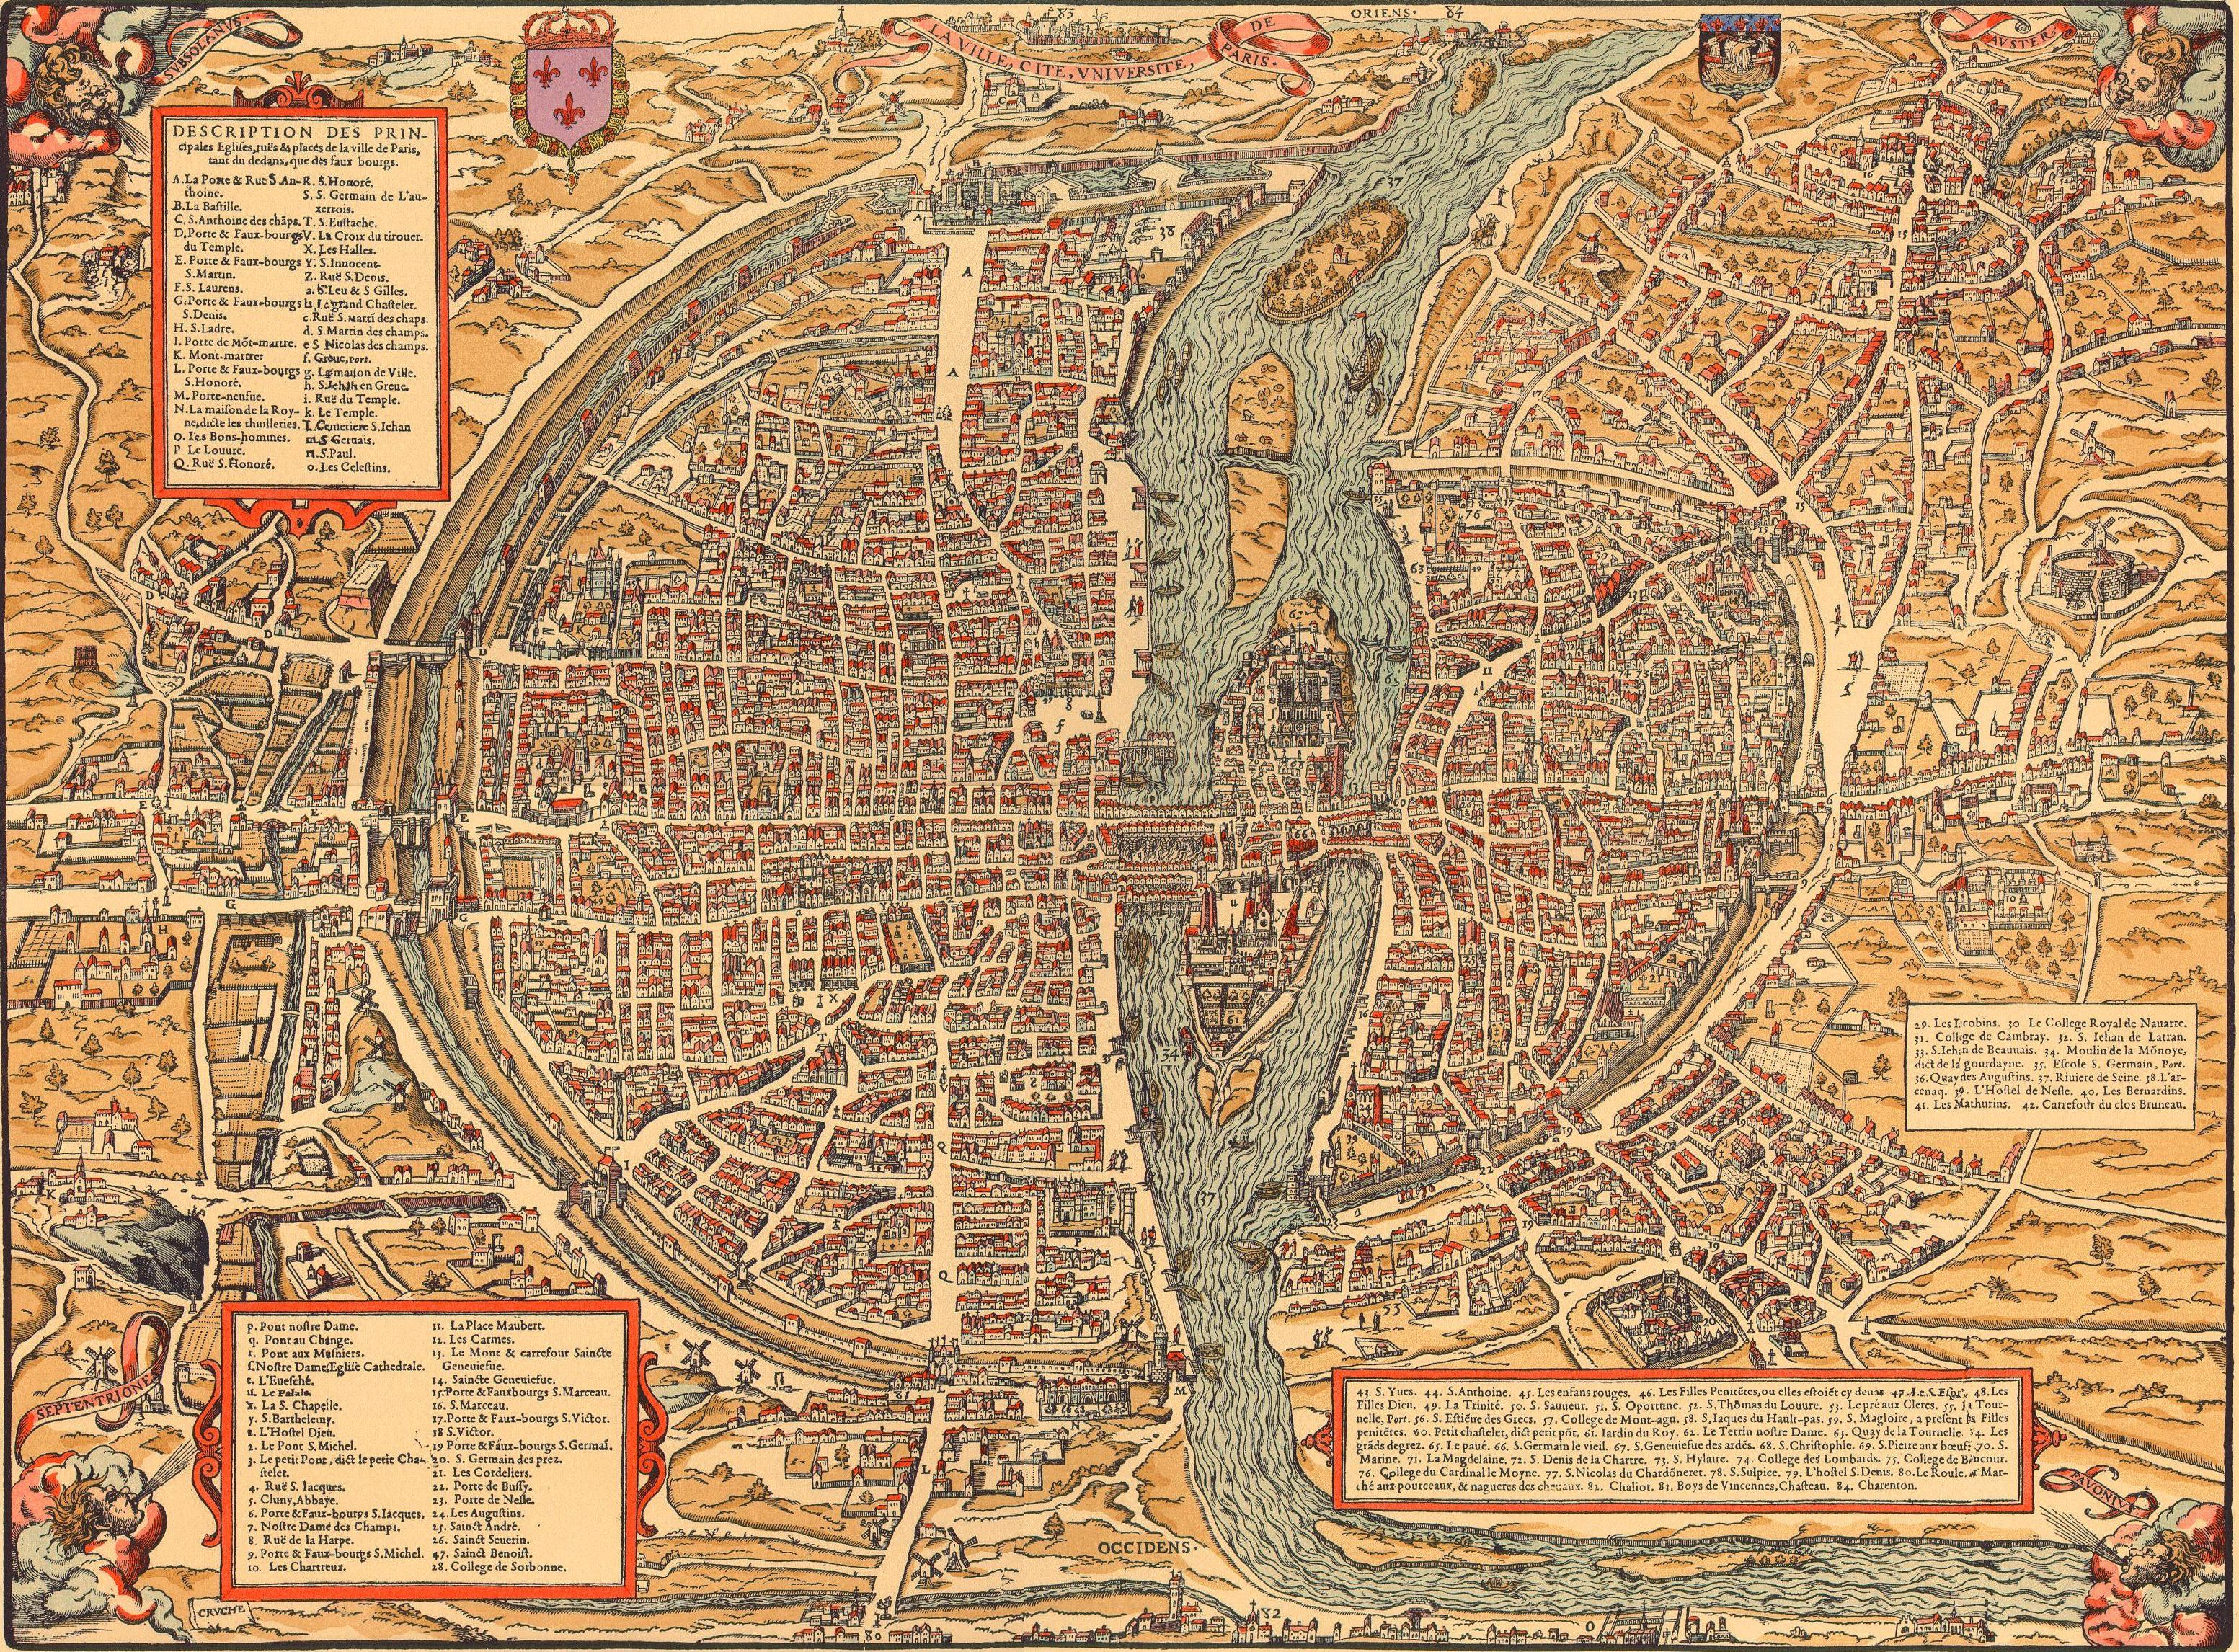 File:Plan de Paris 1575, Belleforest.jpg